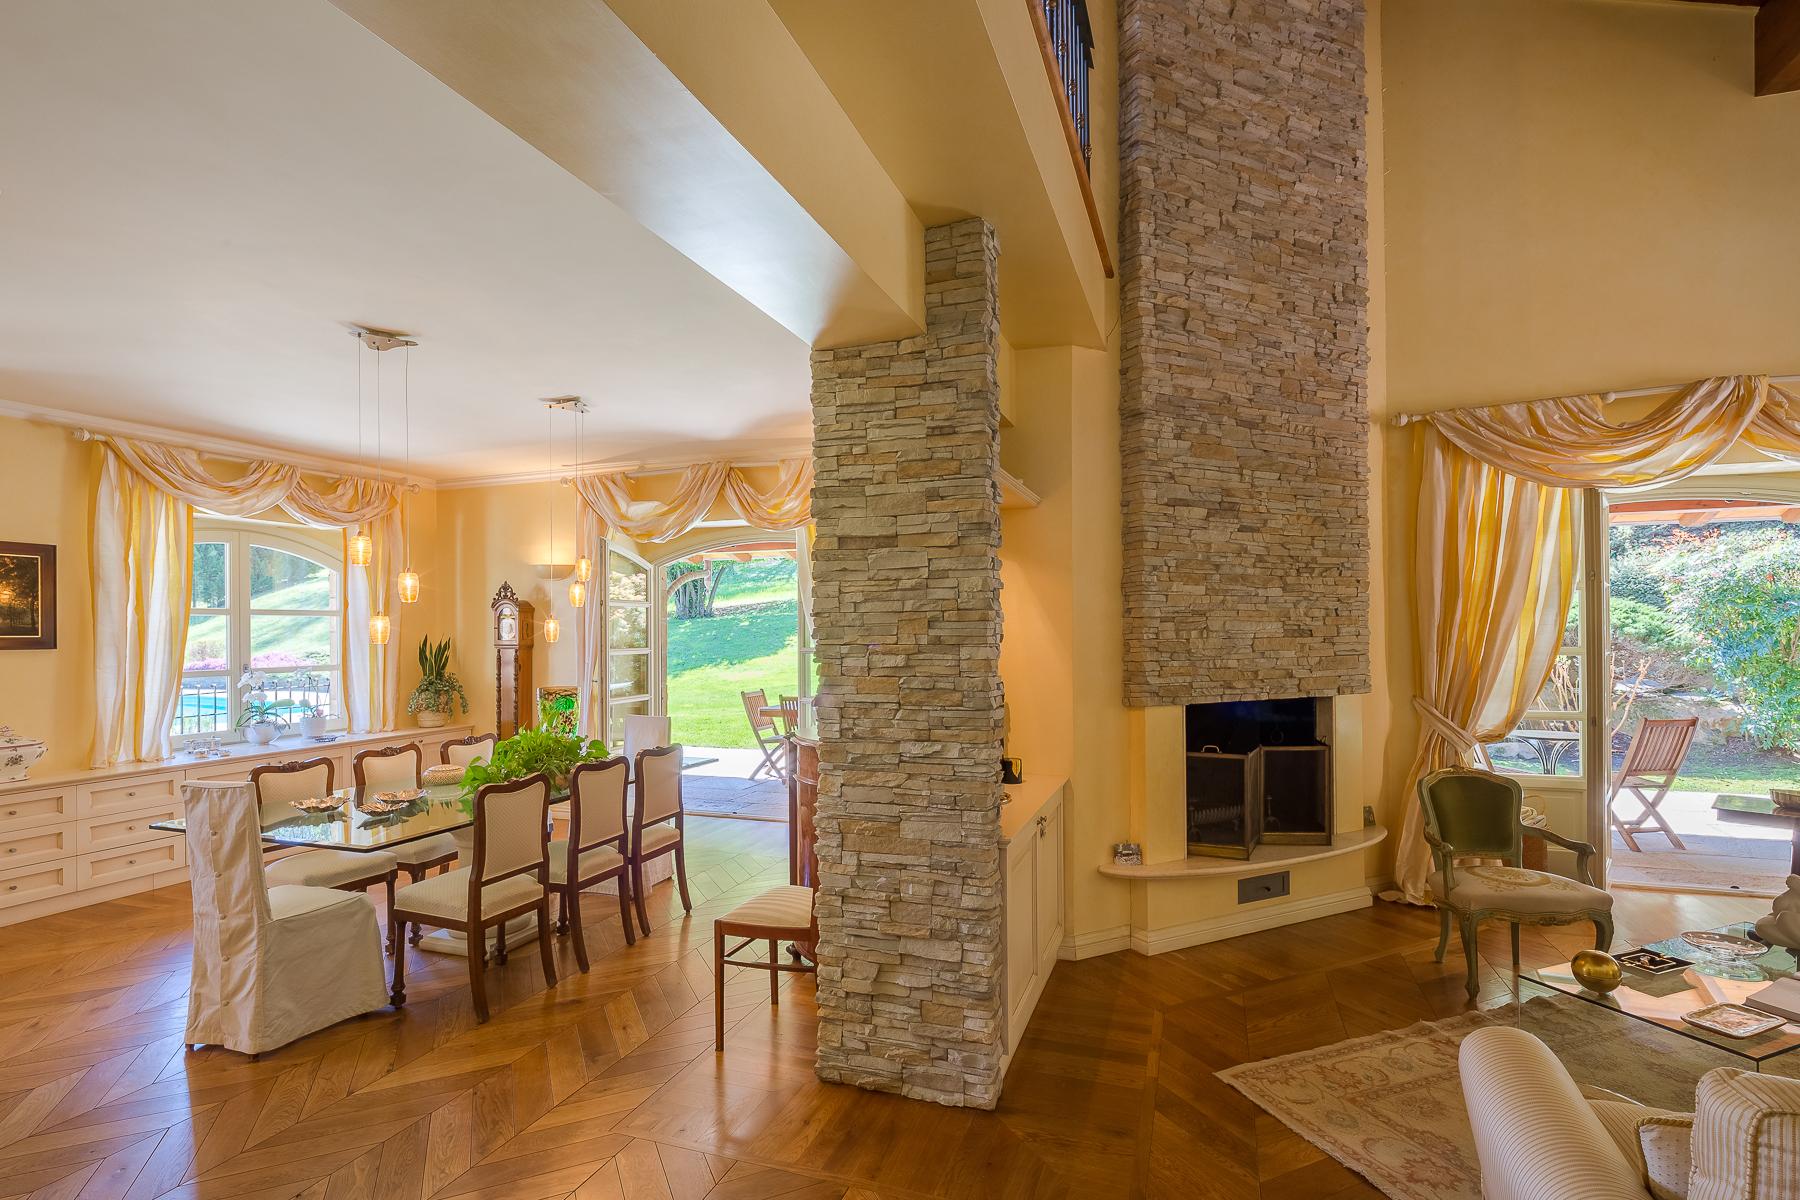 Villa in Vendita a Varese: 5 locali, 470 mq - Foto 11